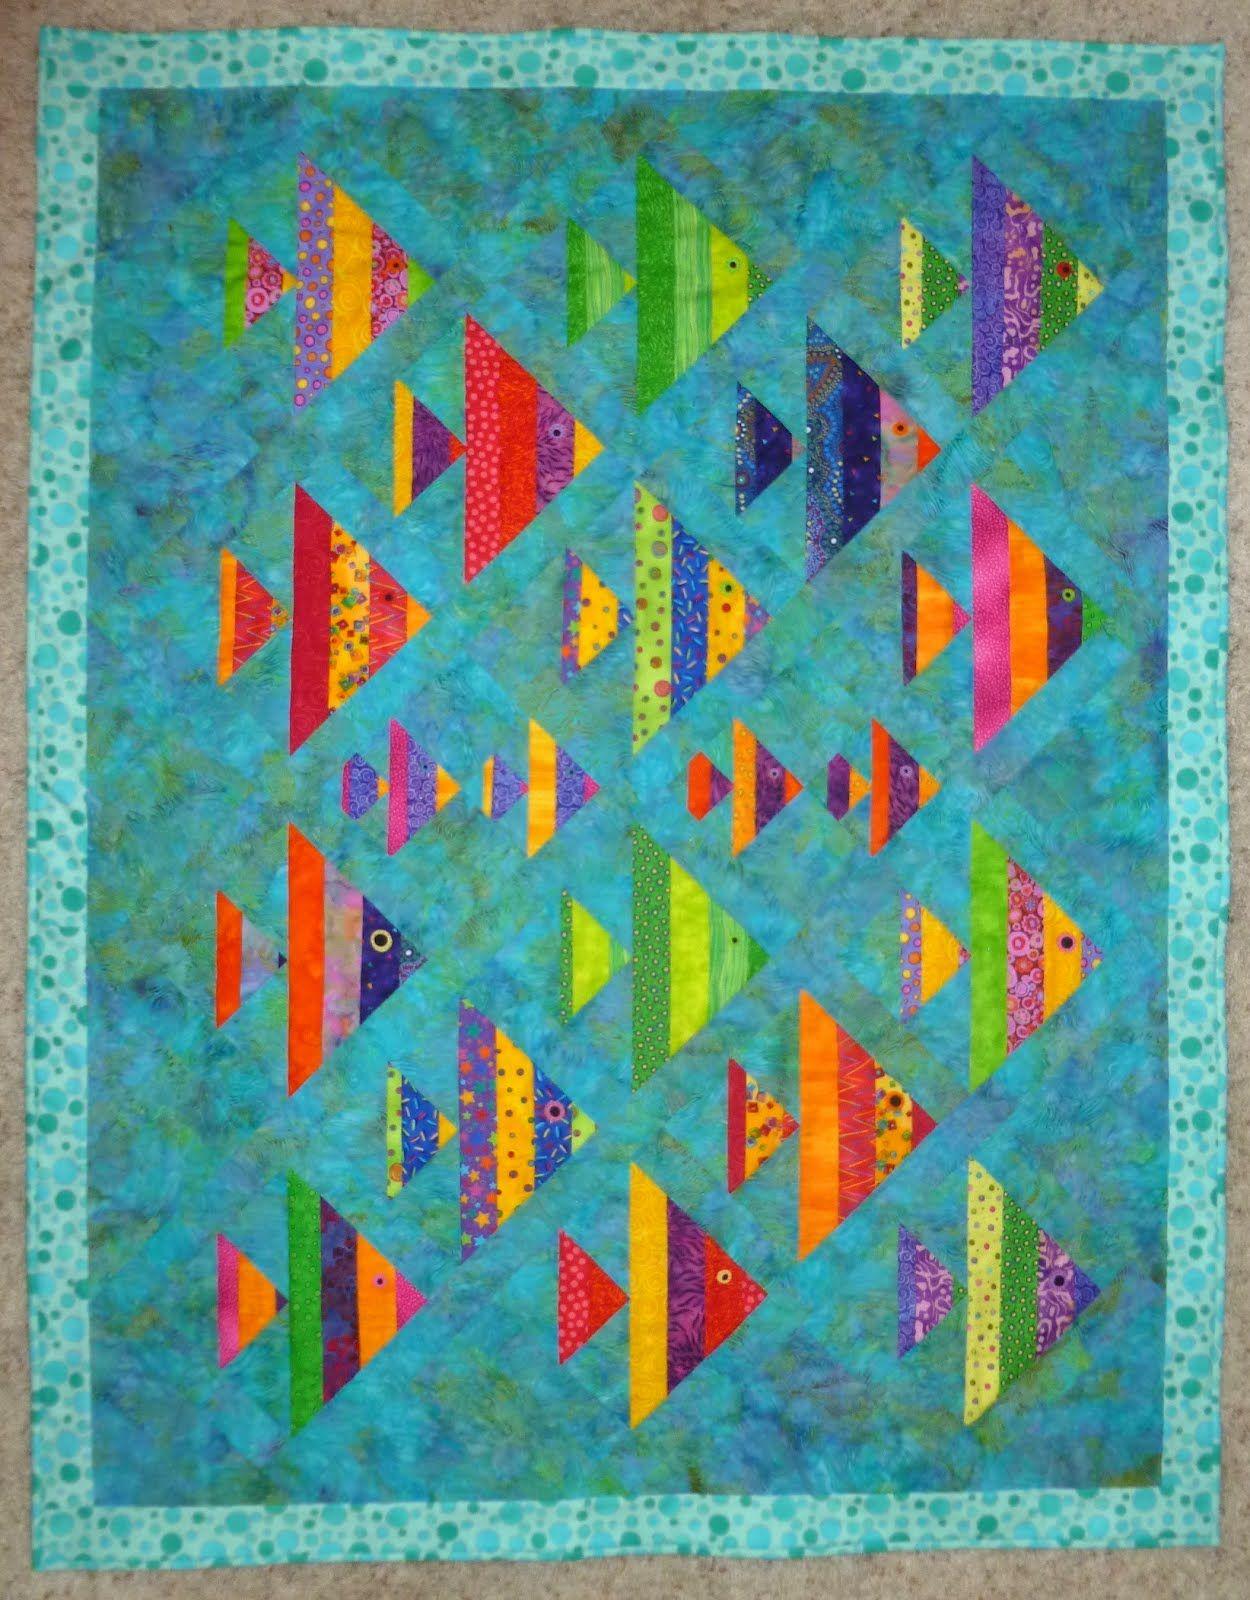 jenni art shark think quilt fish by quilts pin lisa x